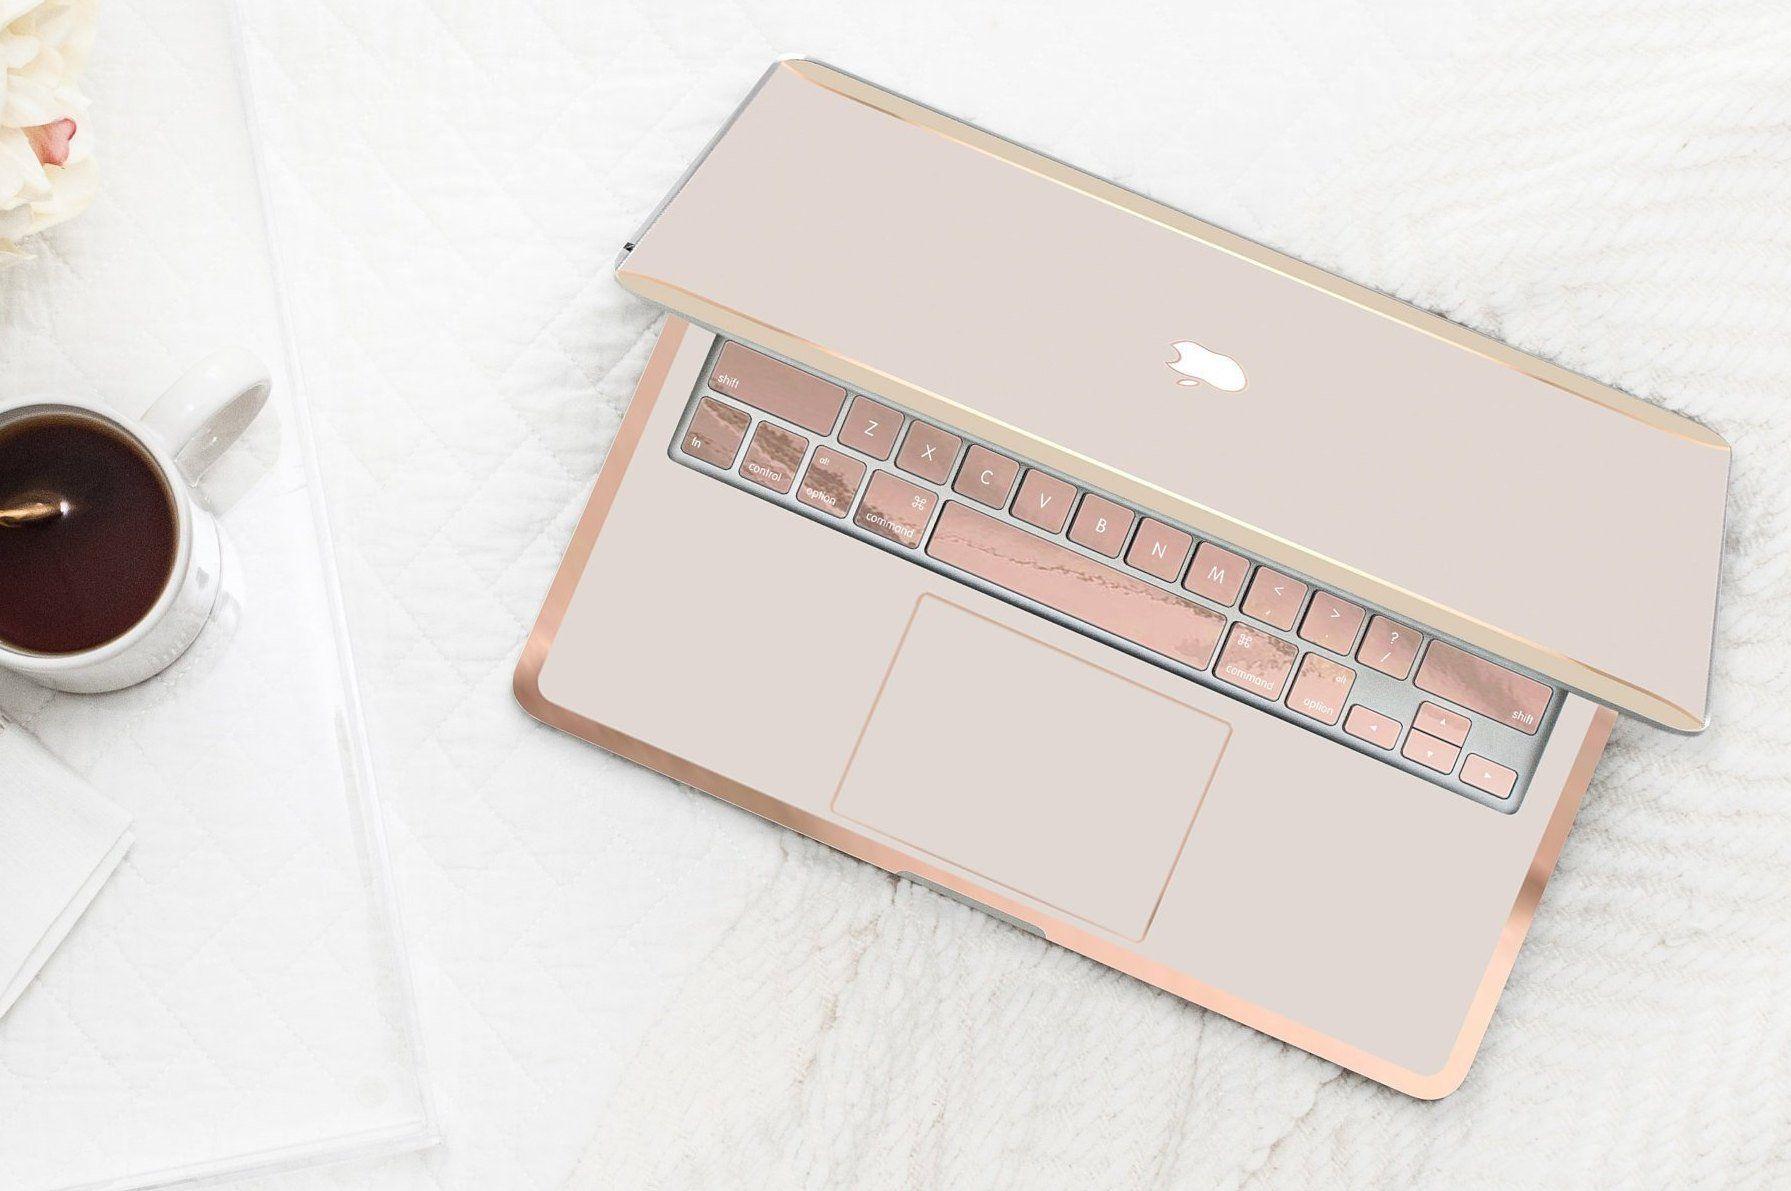 Platinum Edition Macbook Pro 13 Case Marshmallow Duo Tone Etsy Macbook Pro 13 Case Macbook Hard Case Macbook Case